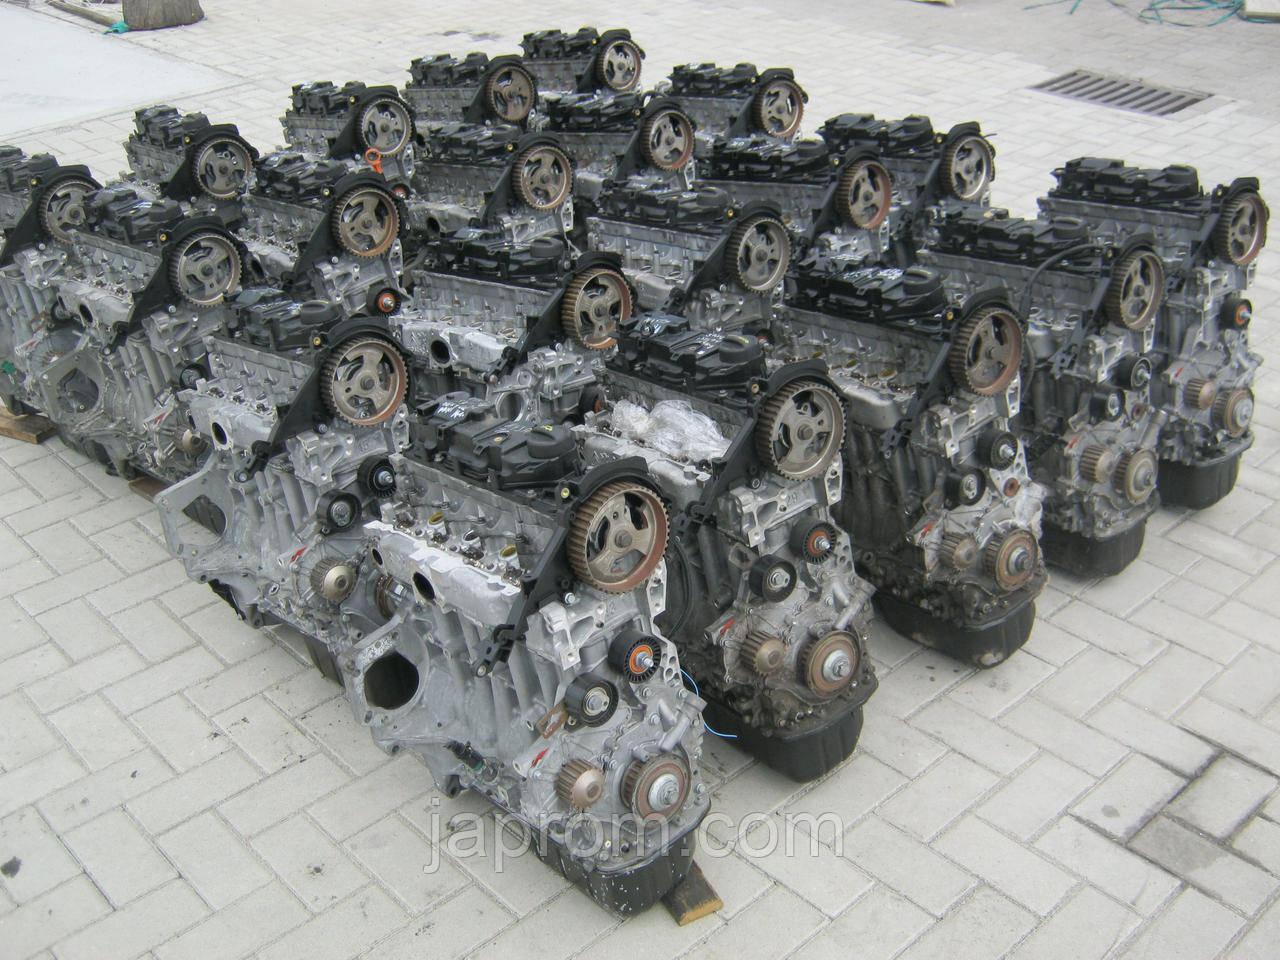 Мотор (Двигатель) Peugeot 308, 3008, 508, 5008, 4007, Expert, Partner1.6 HDI 8V2011-2016г.в.